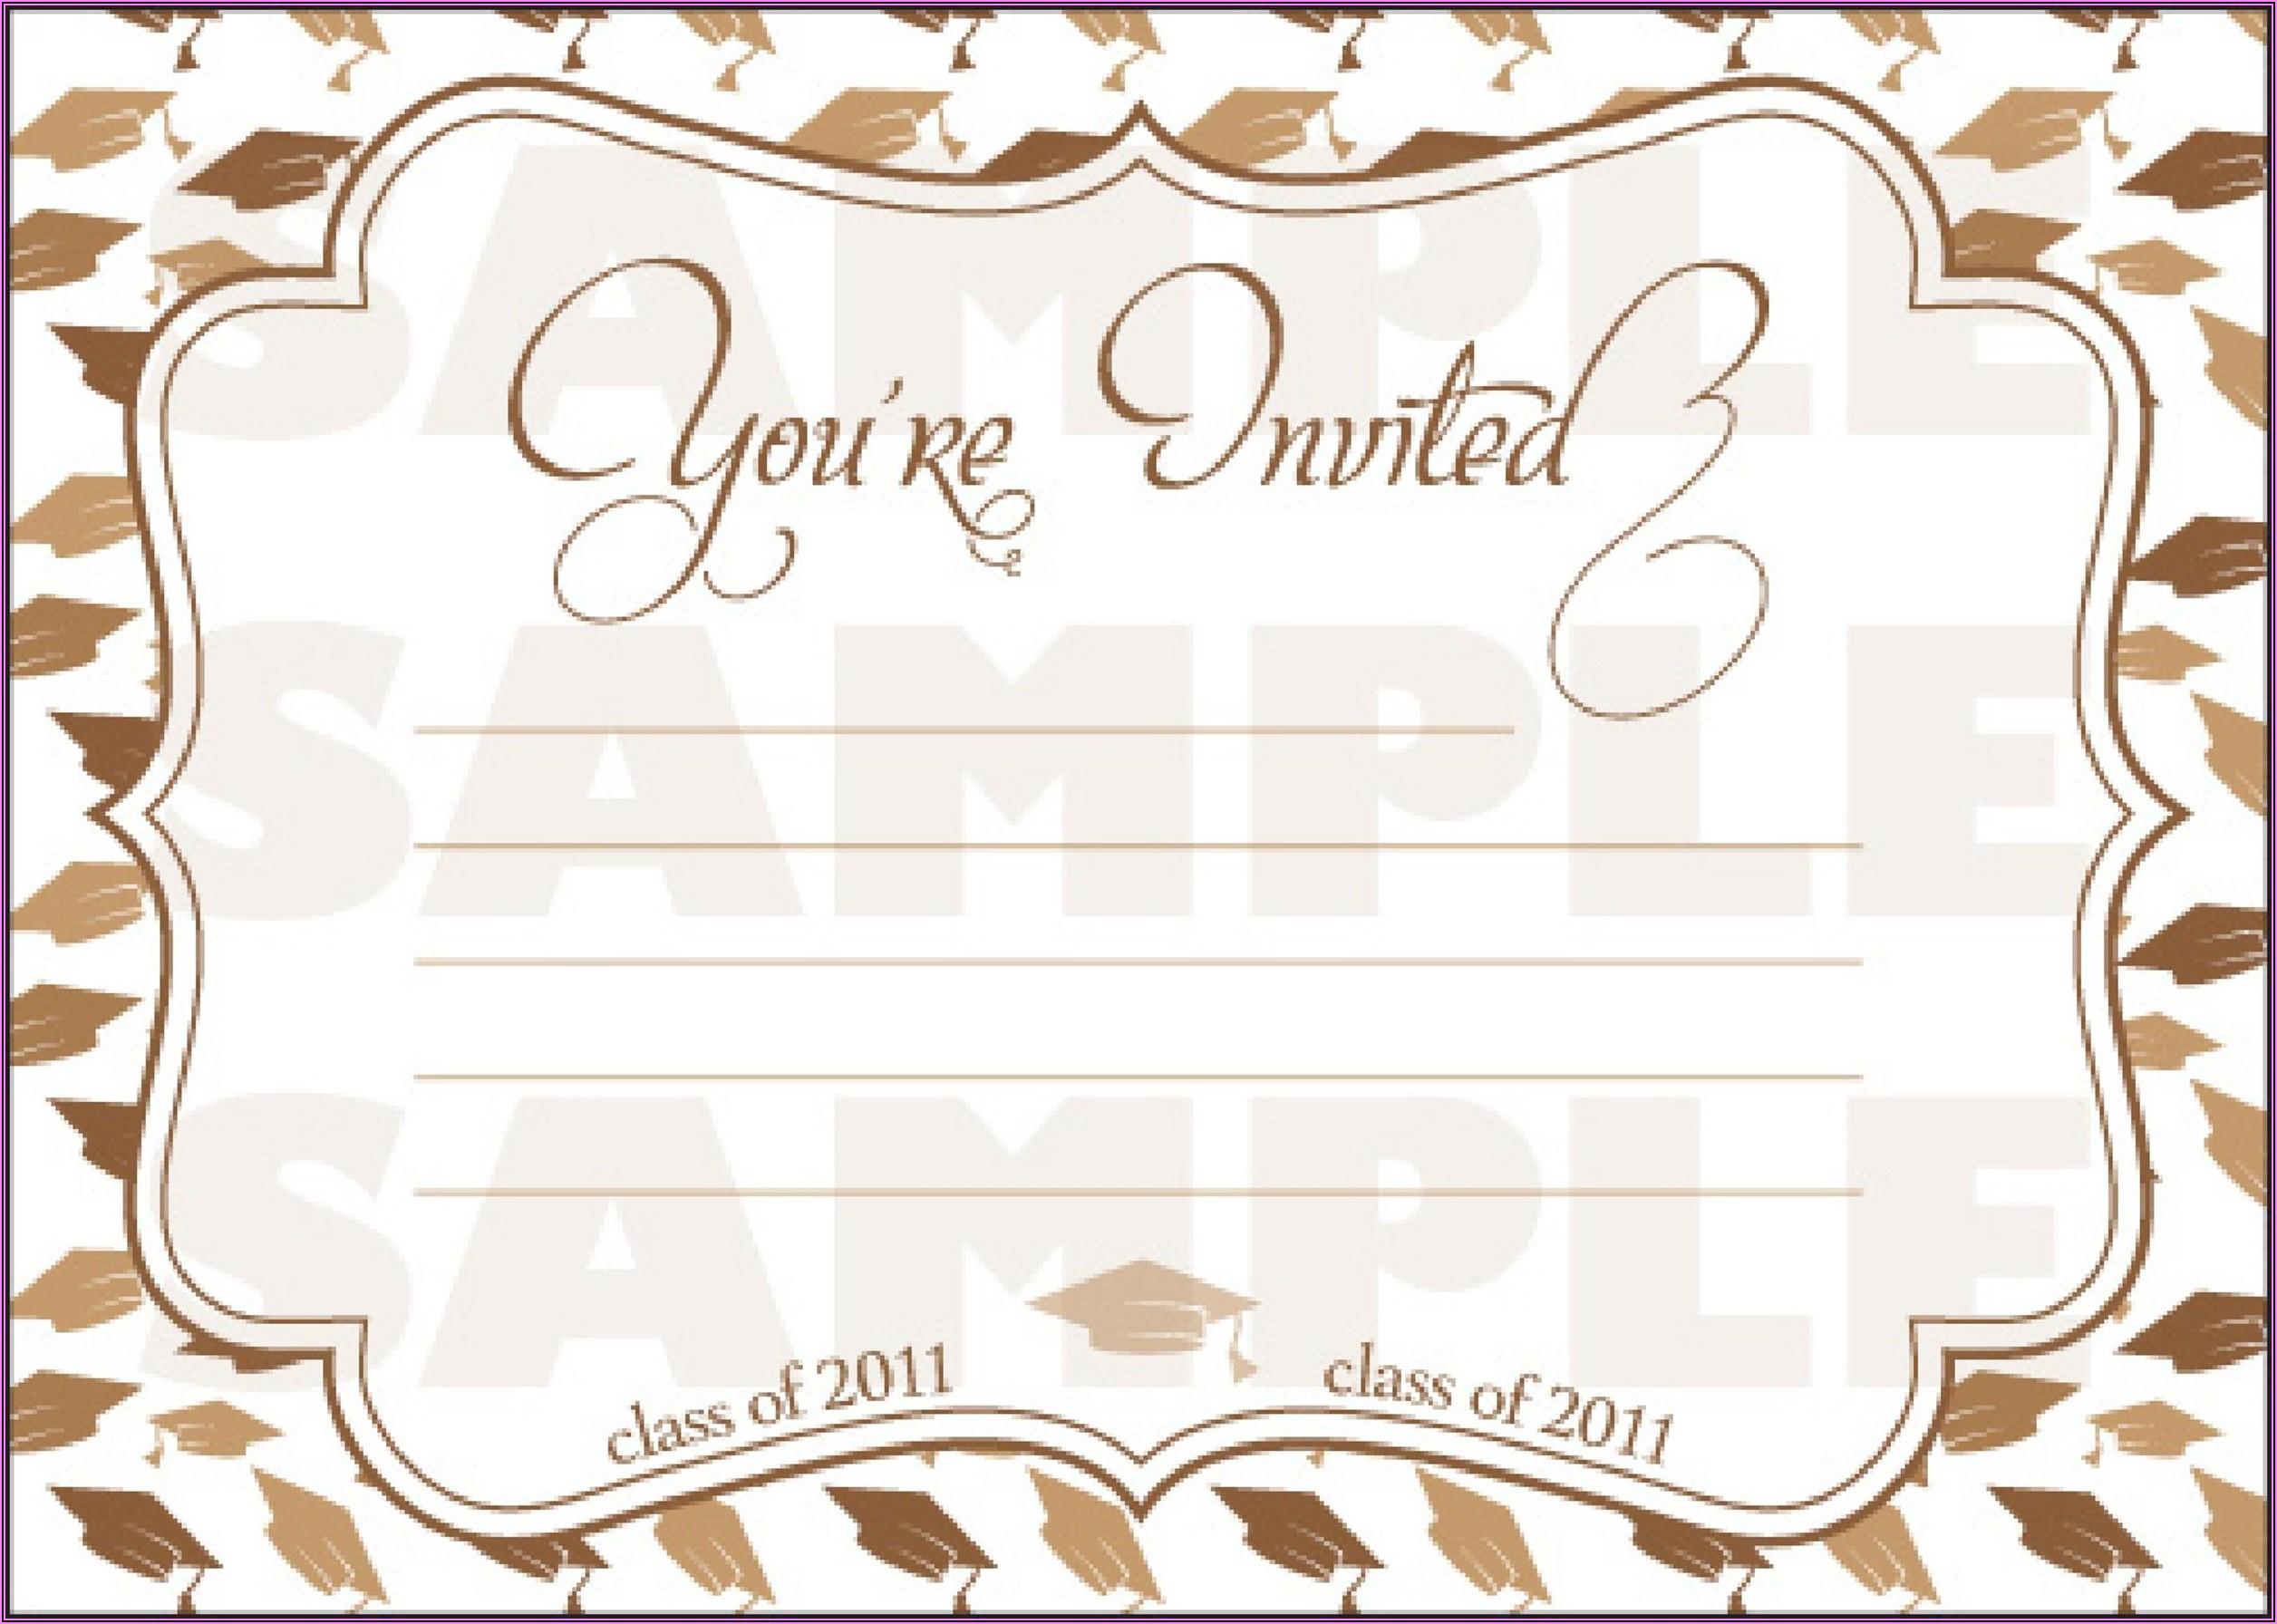 Graduation Ceremony Invitation Cards Samples